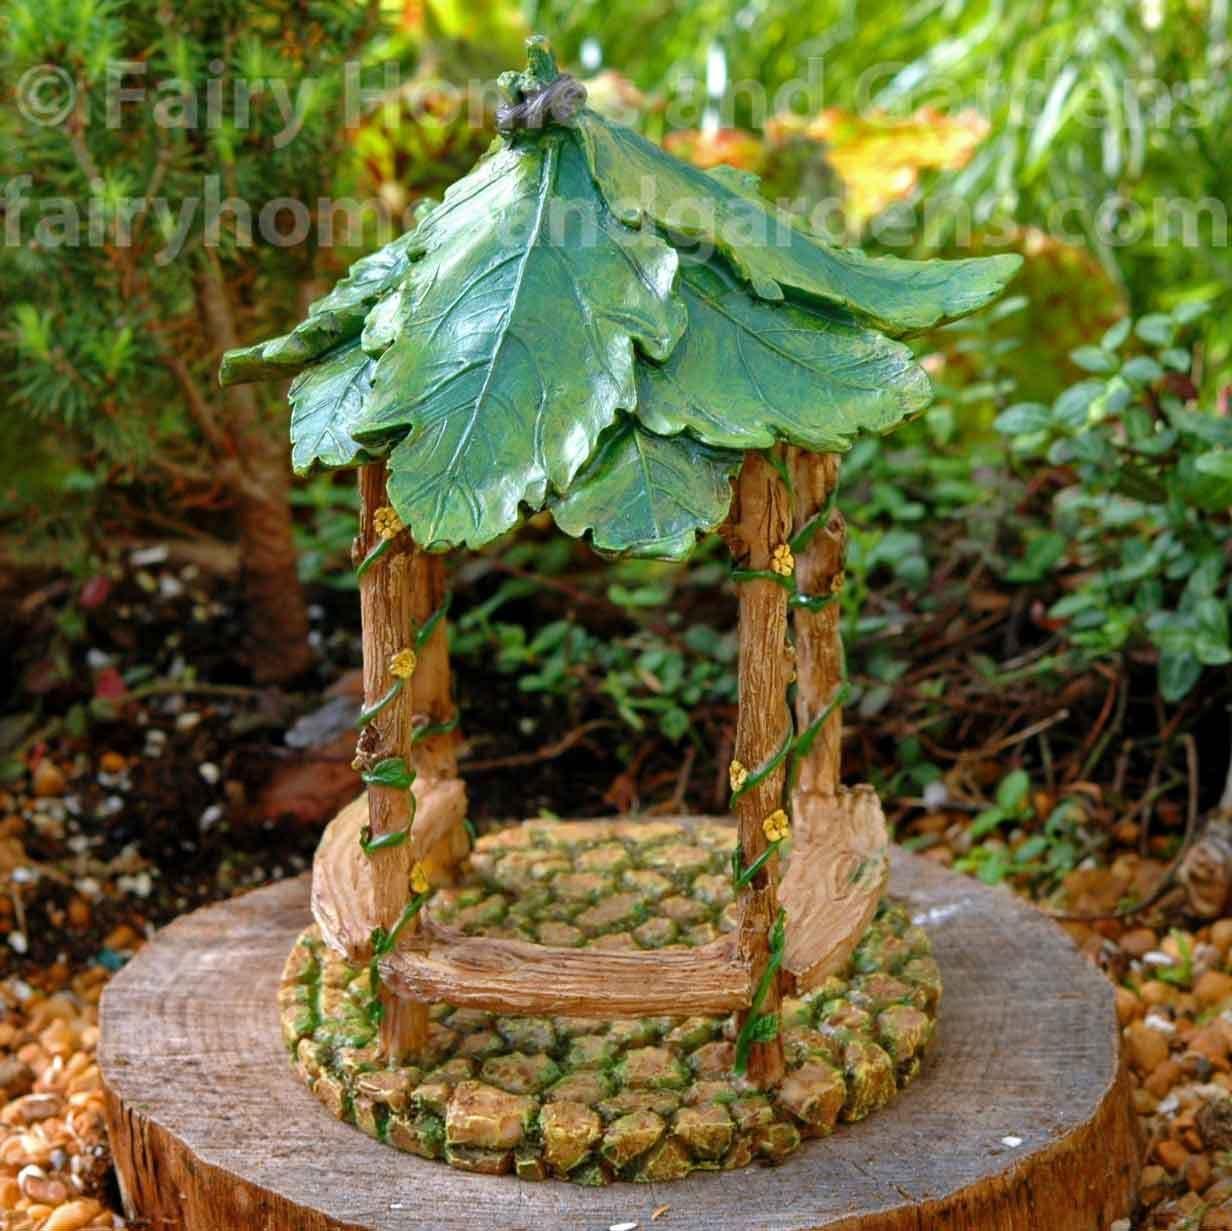 The 50 Best Diy Miniature Fairy Garden Ideas In 2017: Fairy Garden Forest Gazebo